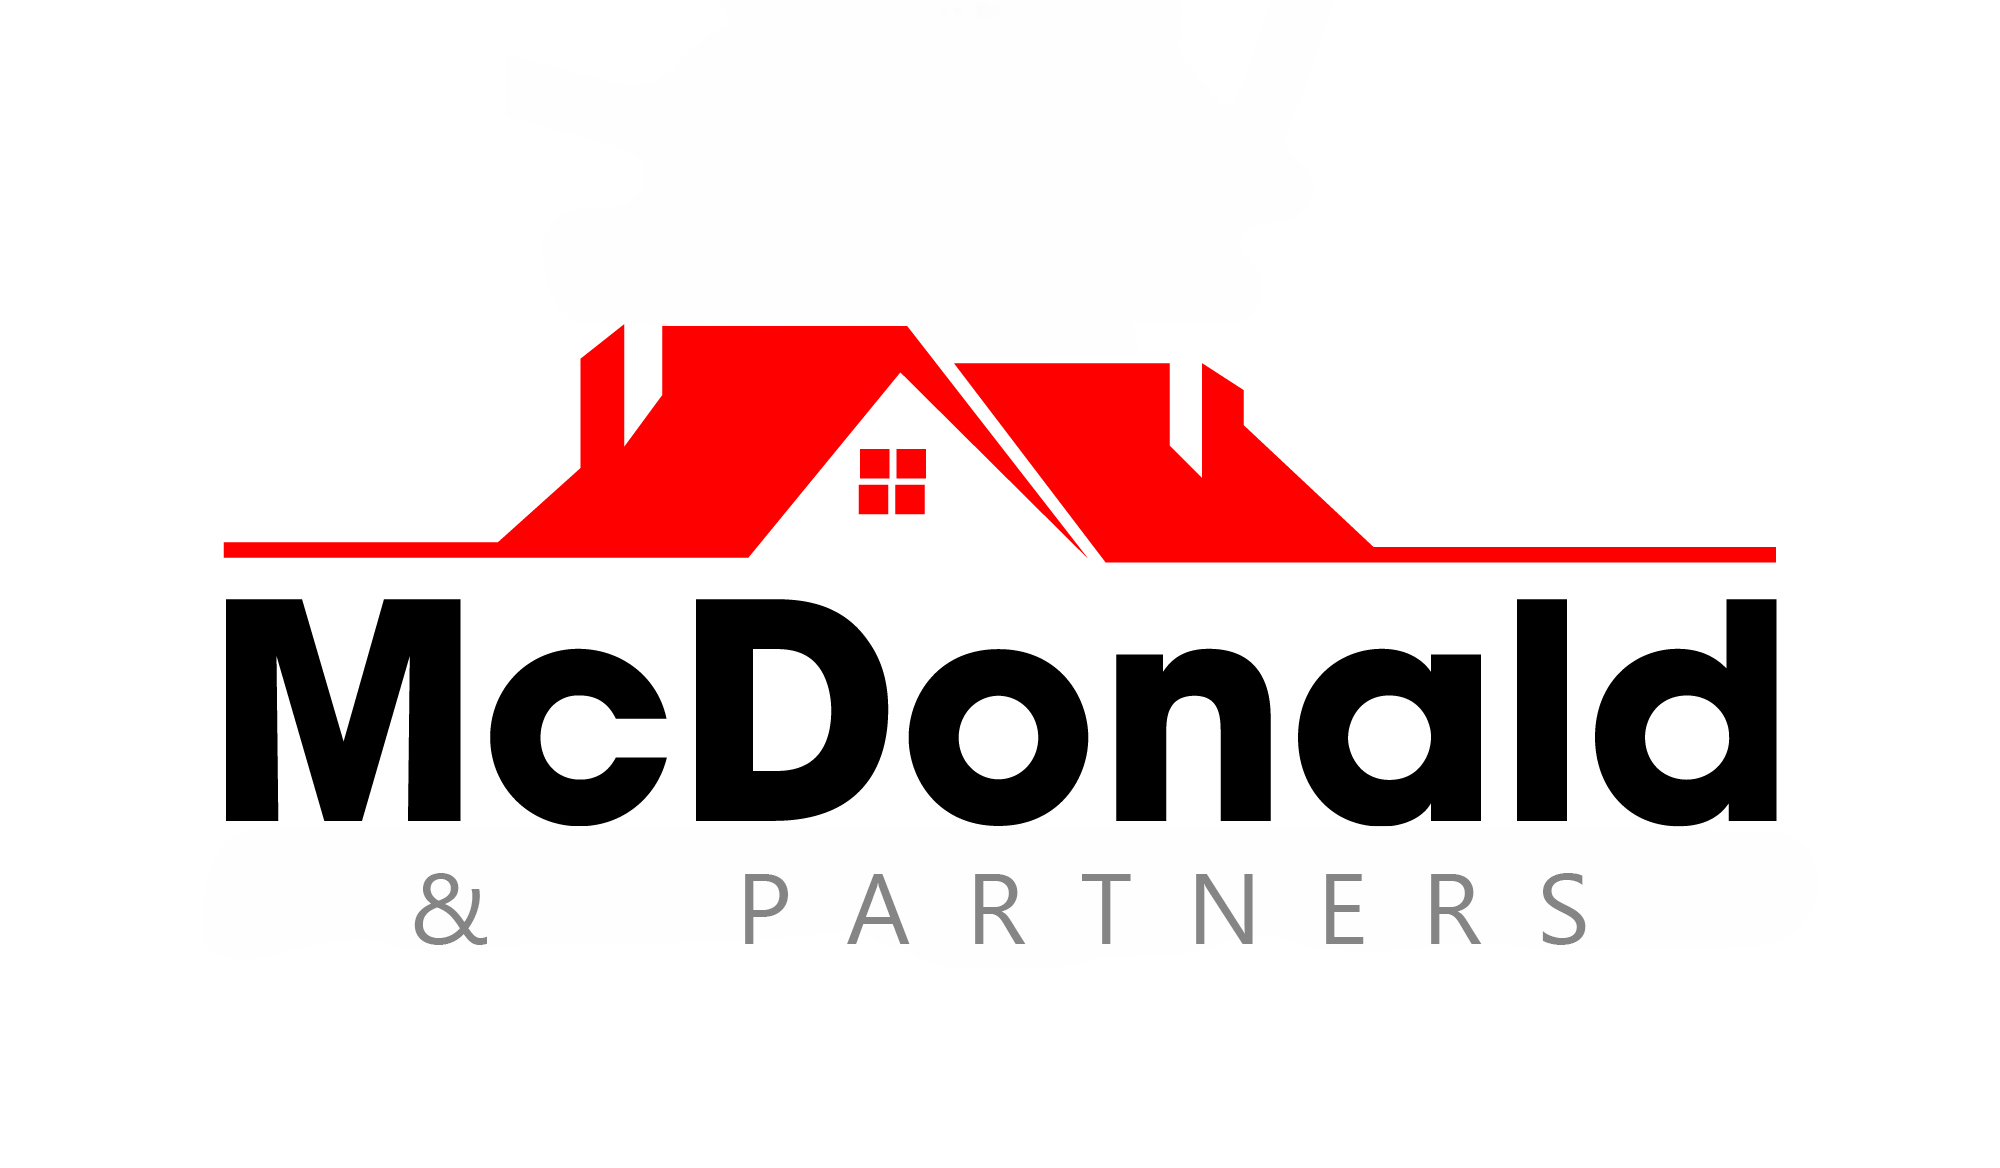 McDonald & Partners Logo